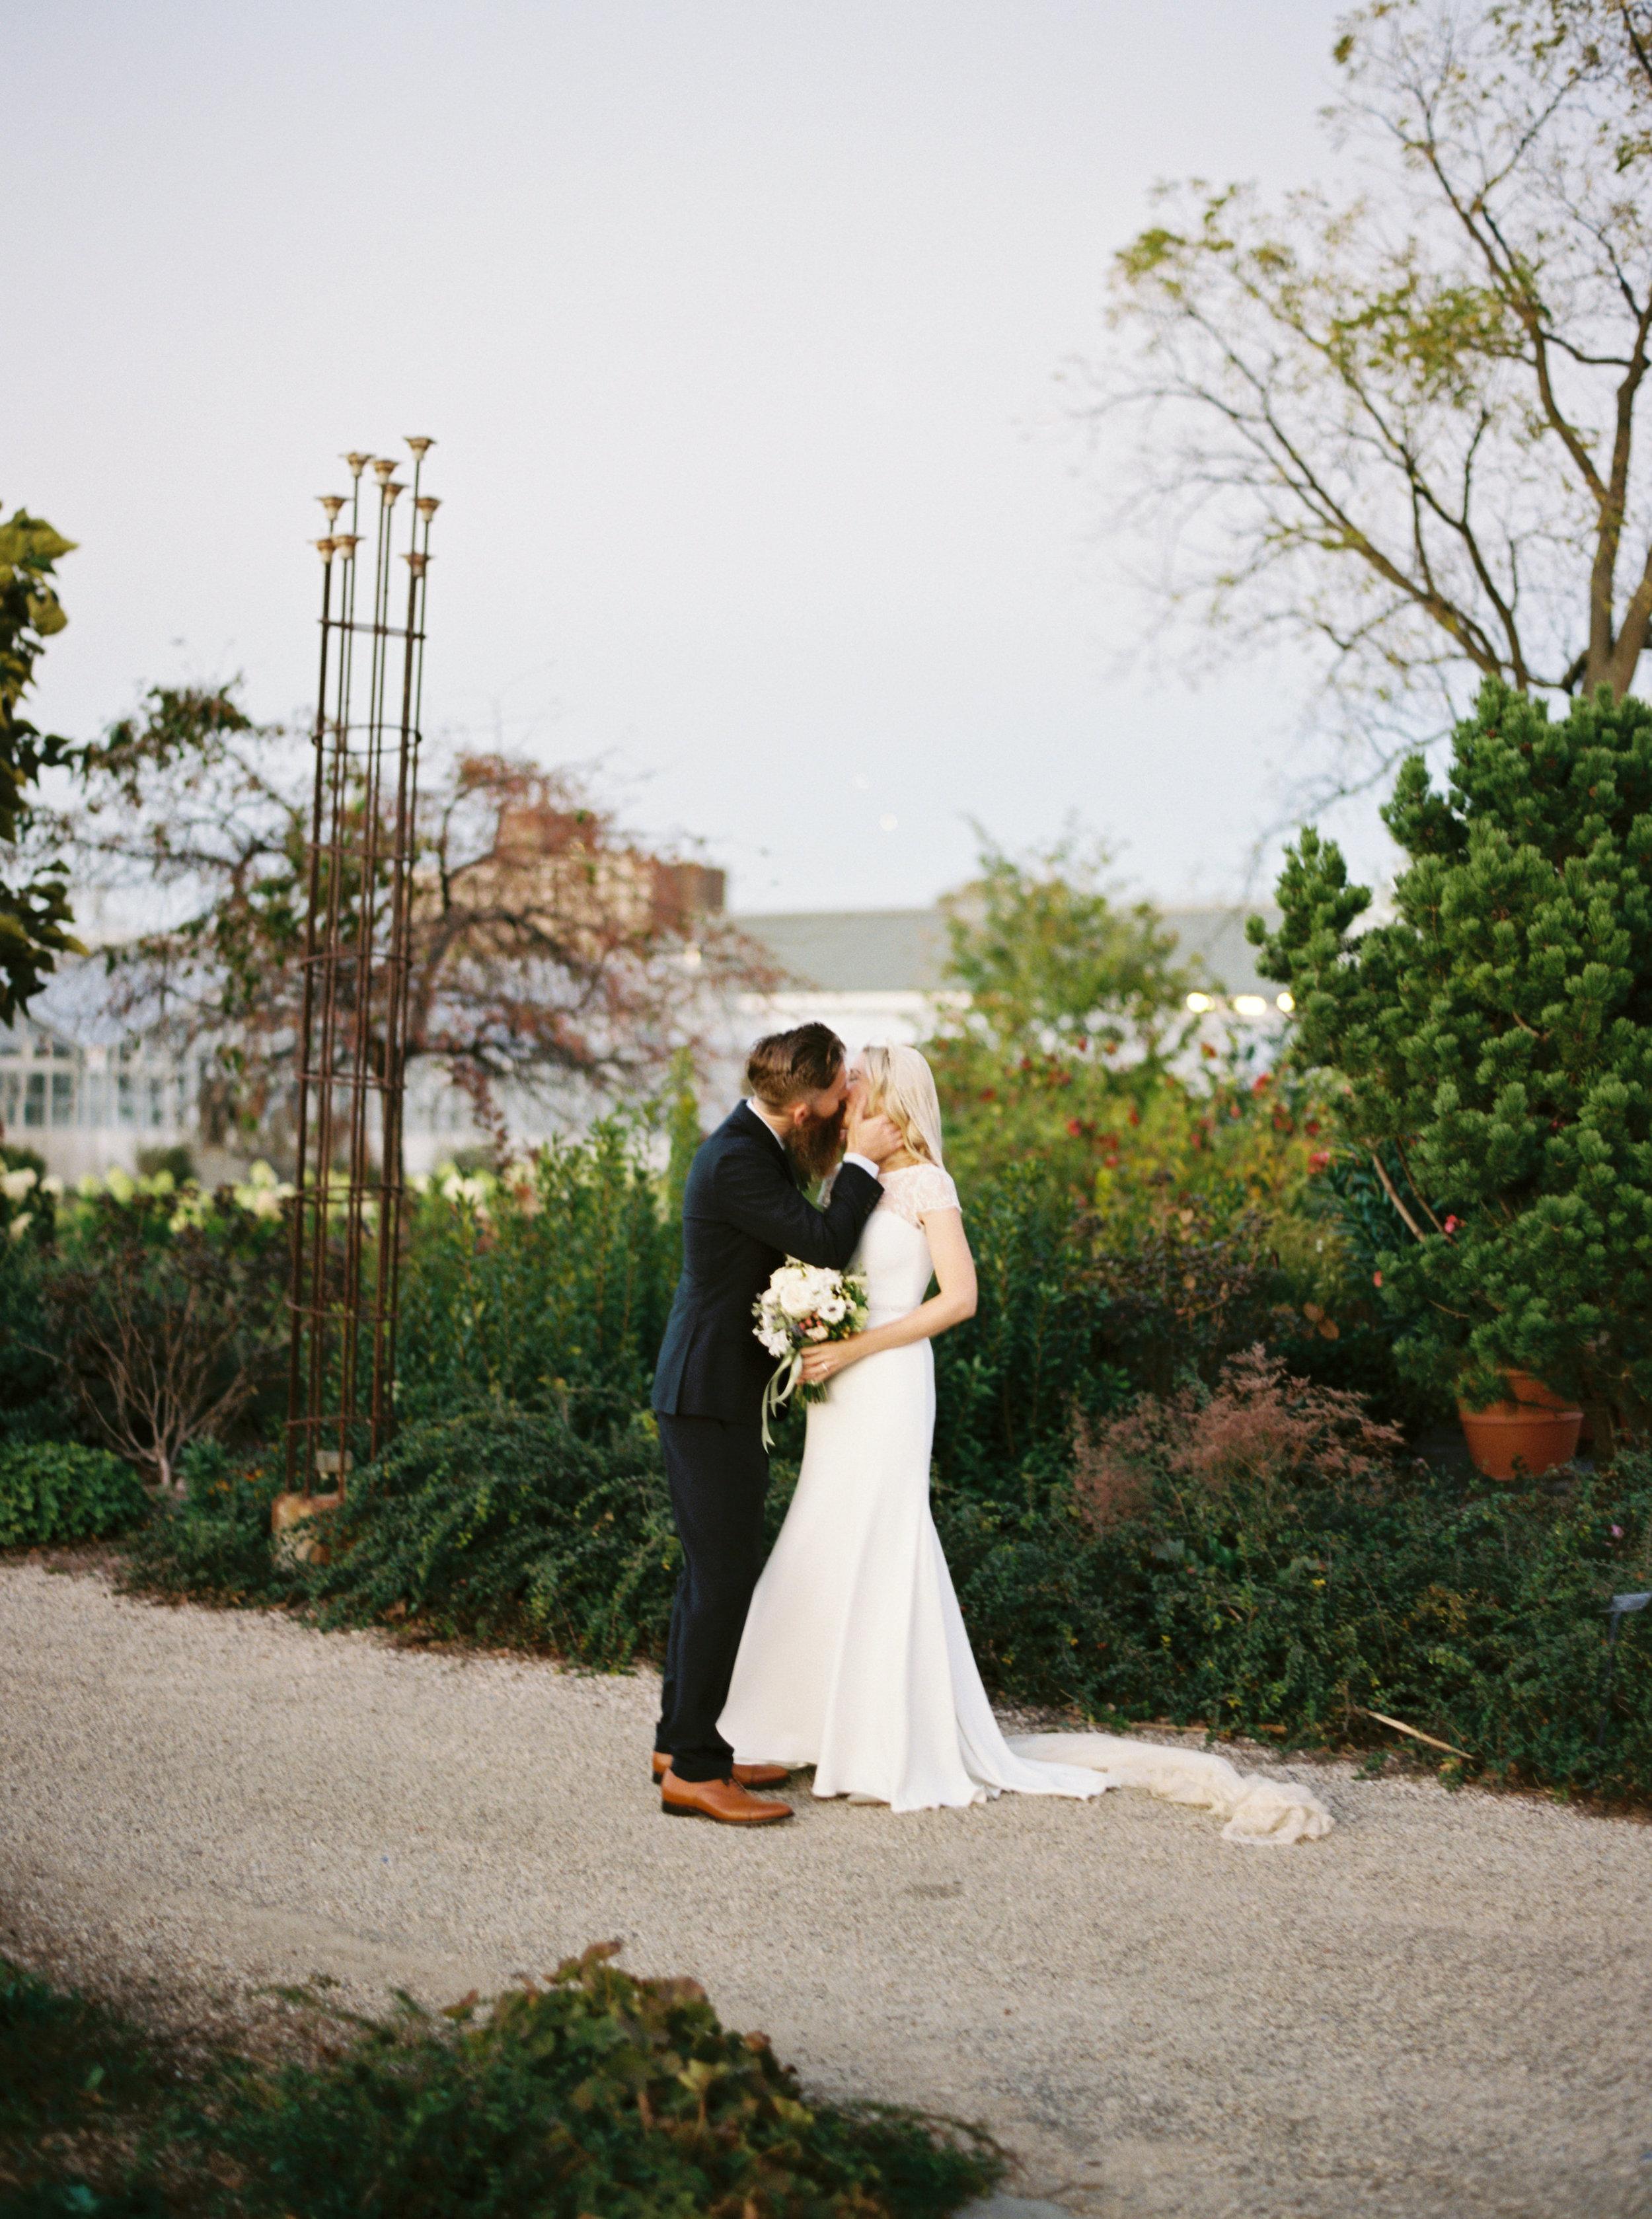 Kyle John l Fine Art Wedding Photography l Chicago, Copenhagen, California, New York, Destination l Blog l Alice & Aaron_24